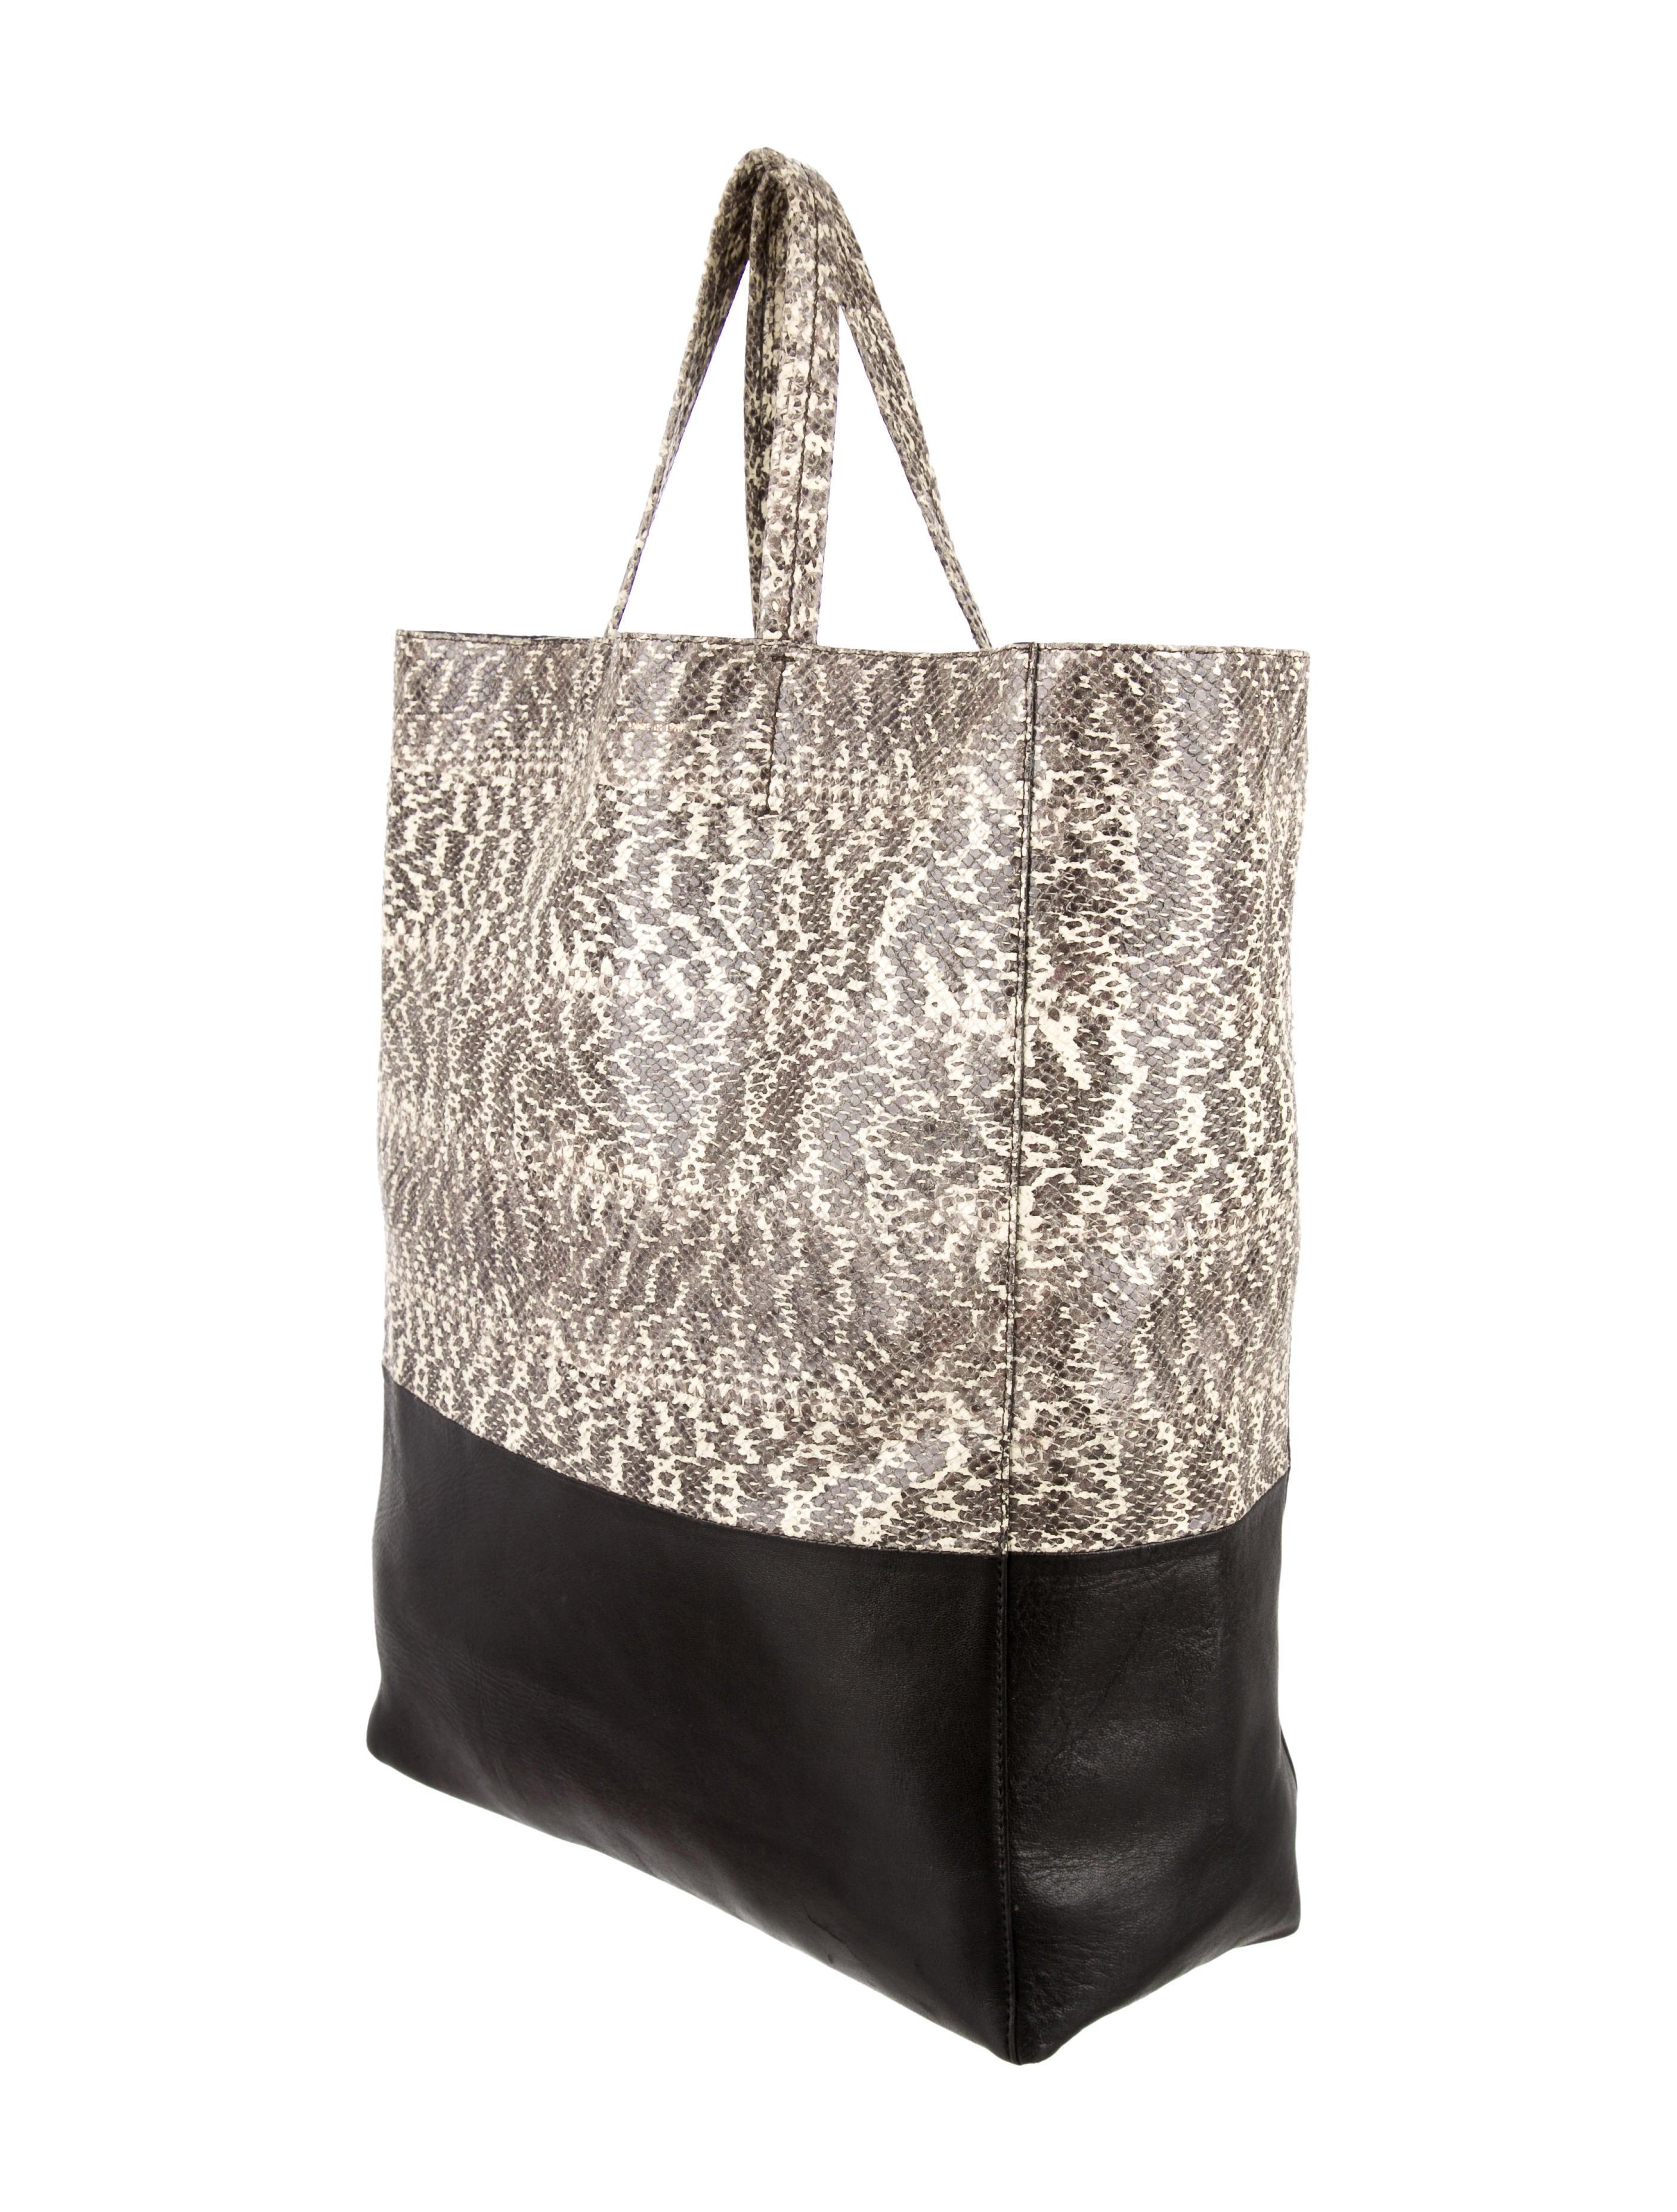 celine black leather luggage tote bag - C��line Bi-Color Vertical Cabas Tote - Handbags - CEL32844 | The ...